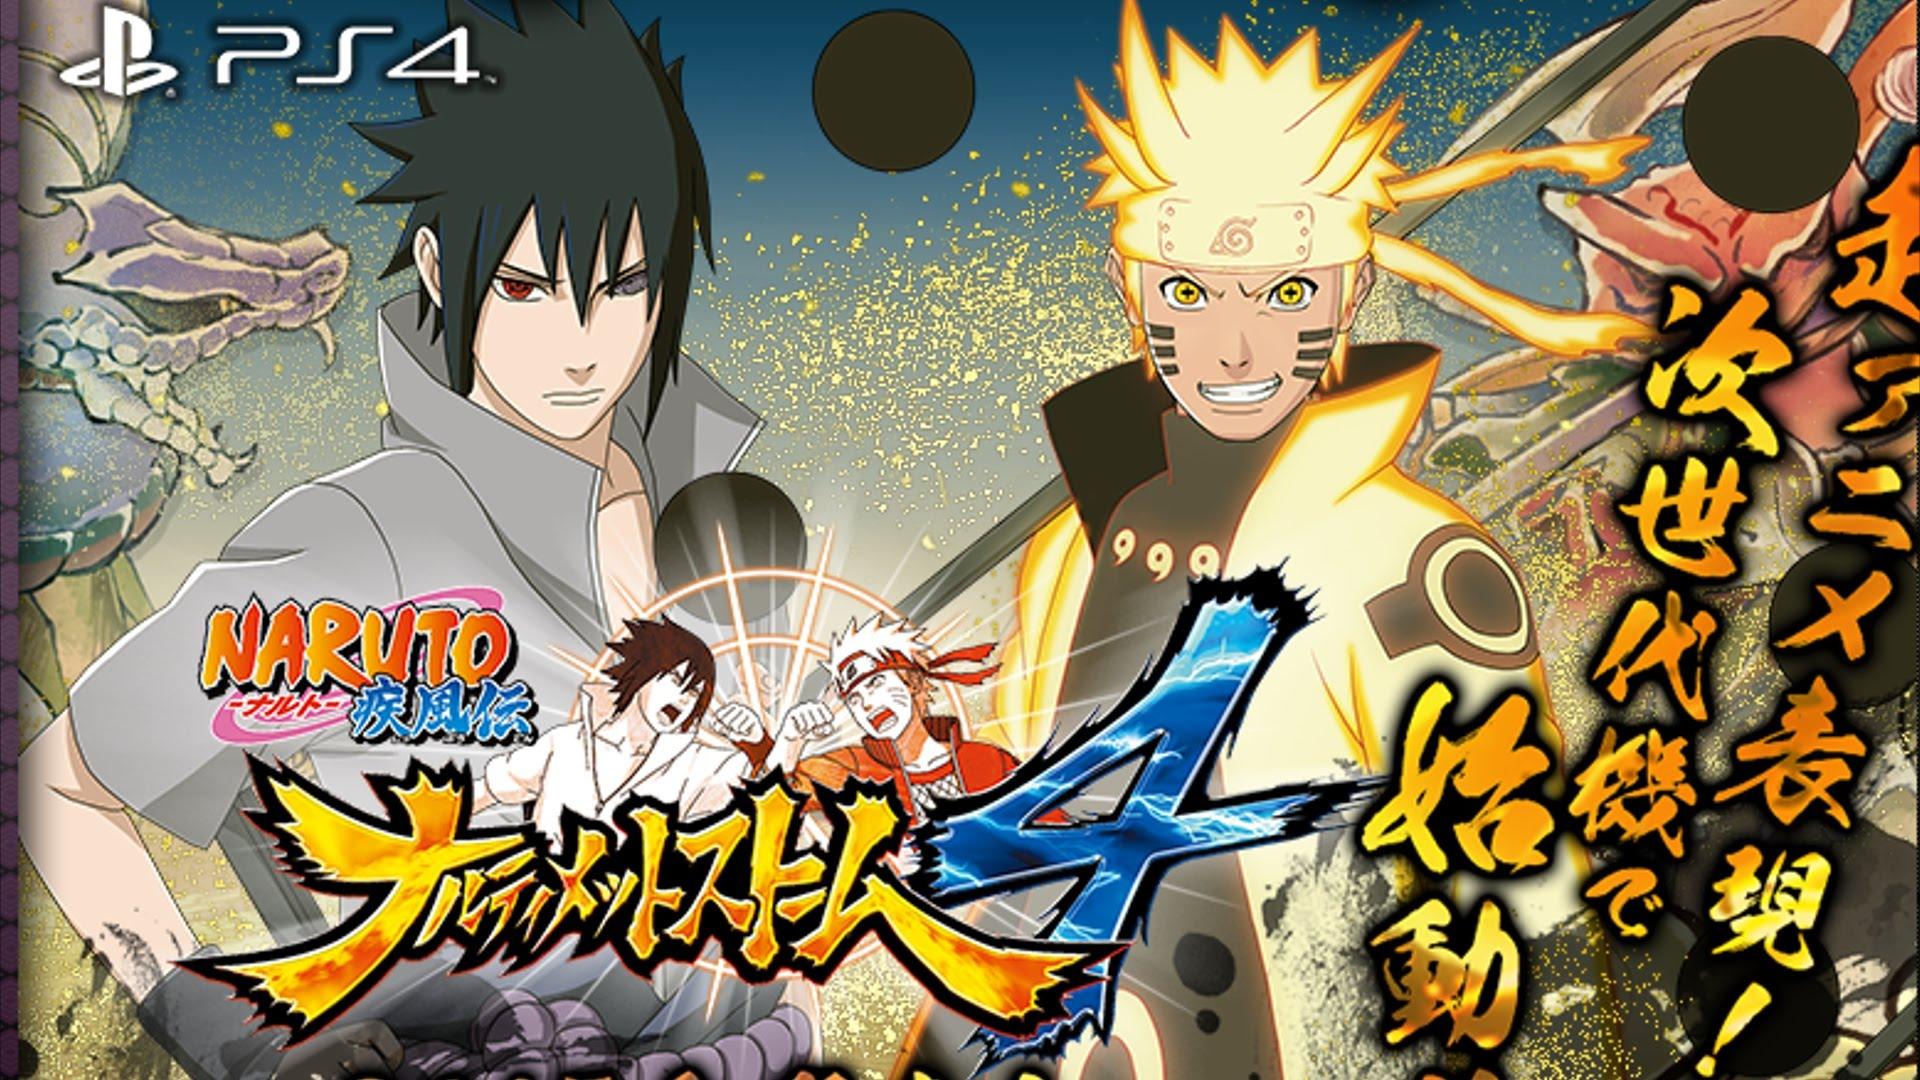 Naruto Shippuden Ultimate Ninja Storm 4 - Official Website (PS4